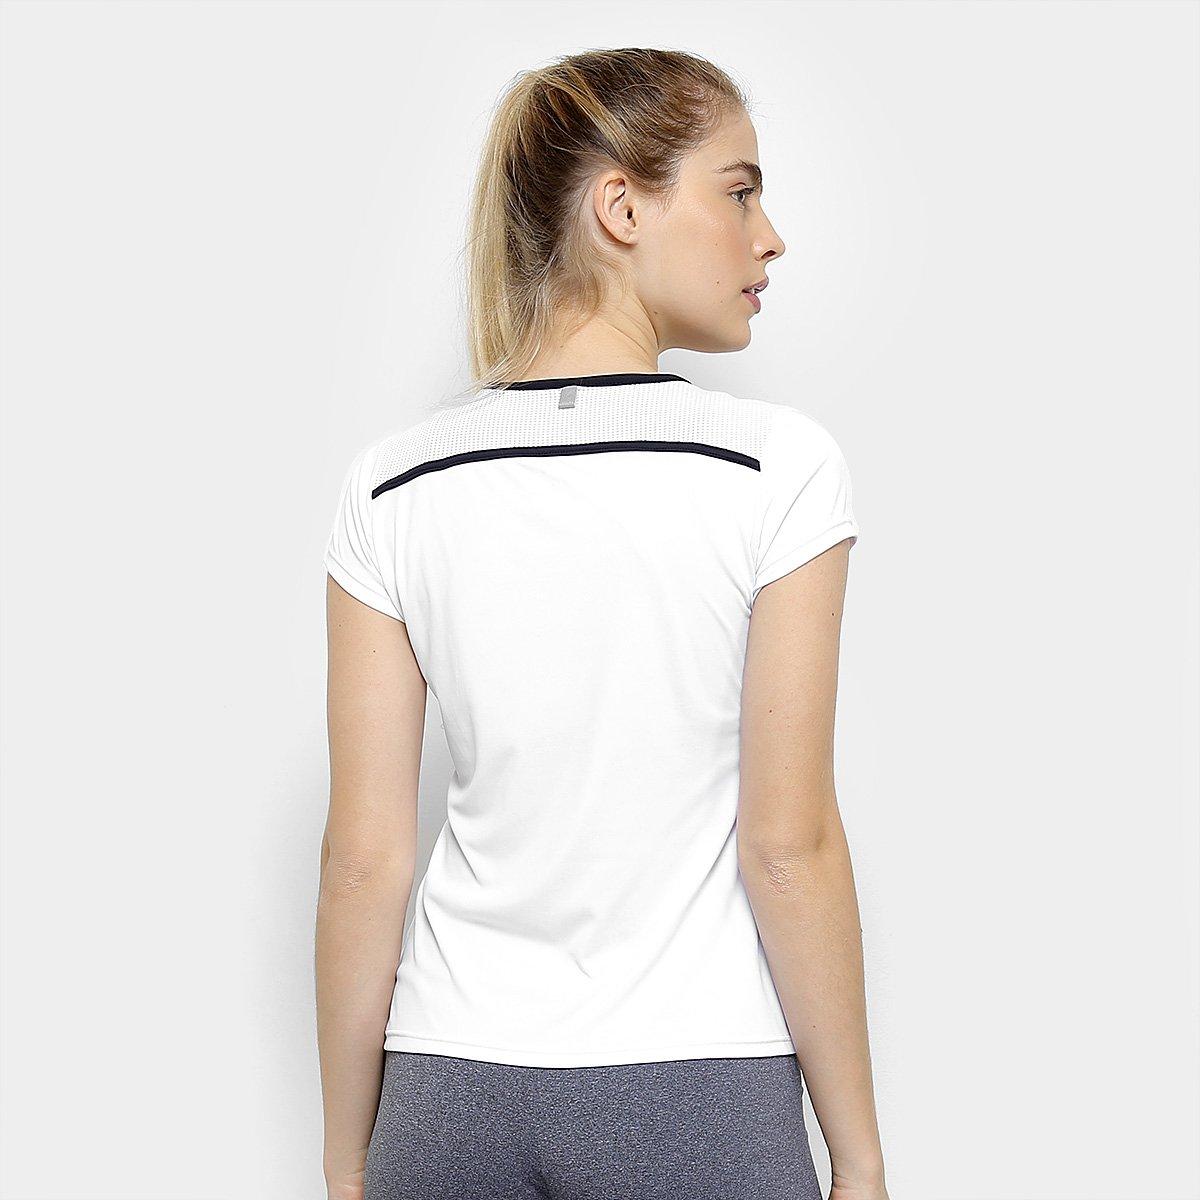 Camiseta Área Sports Planet Feminina  Camiseta Área Sports Planet Feminina  ... f614f7d1b1